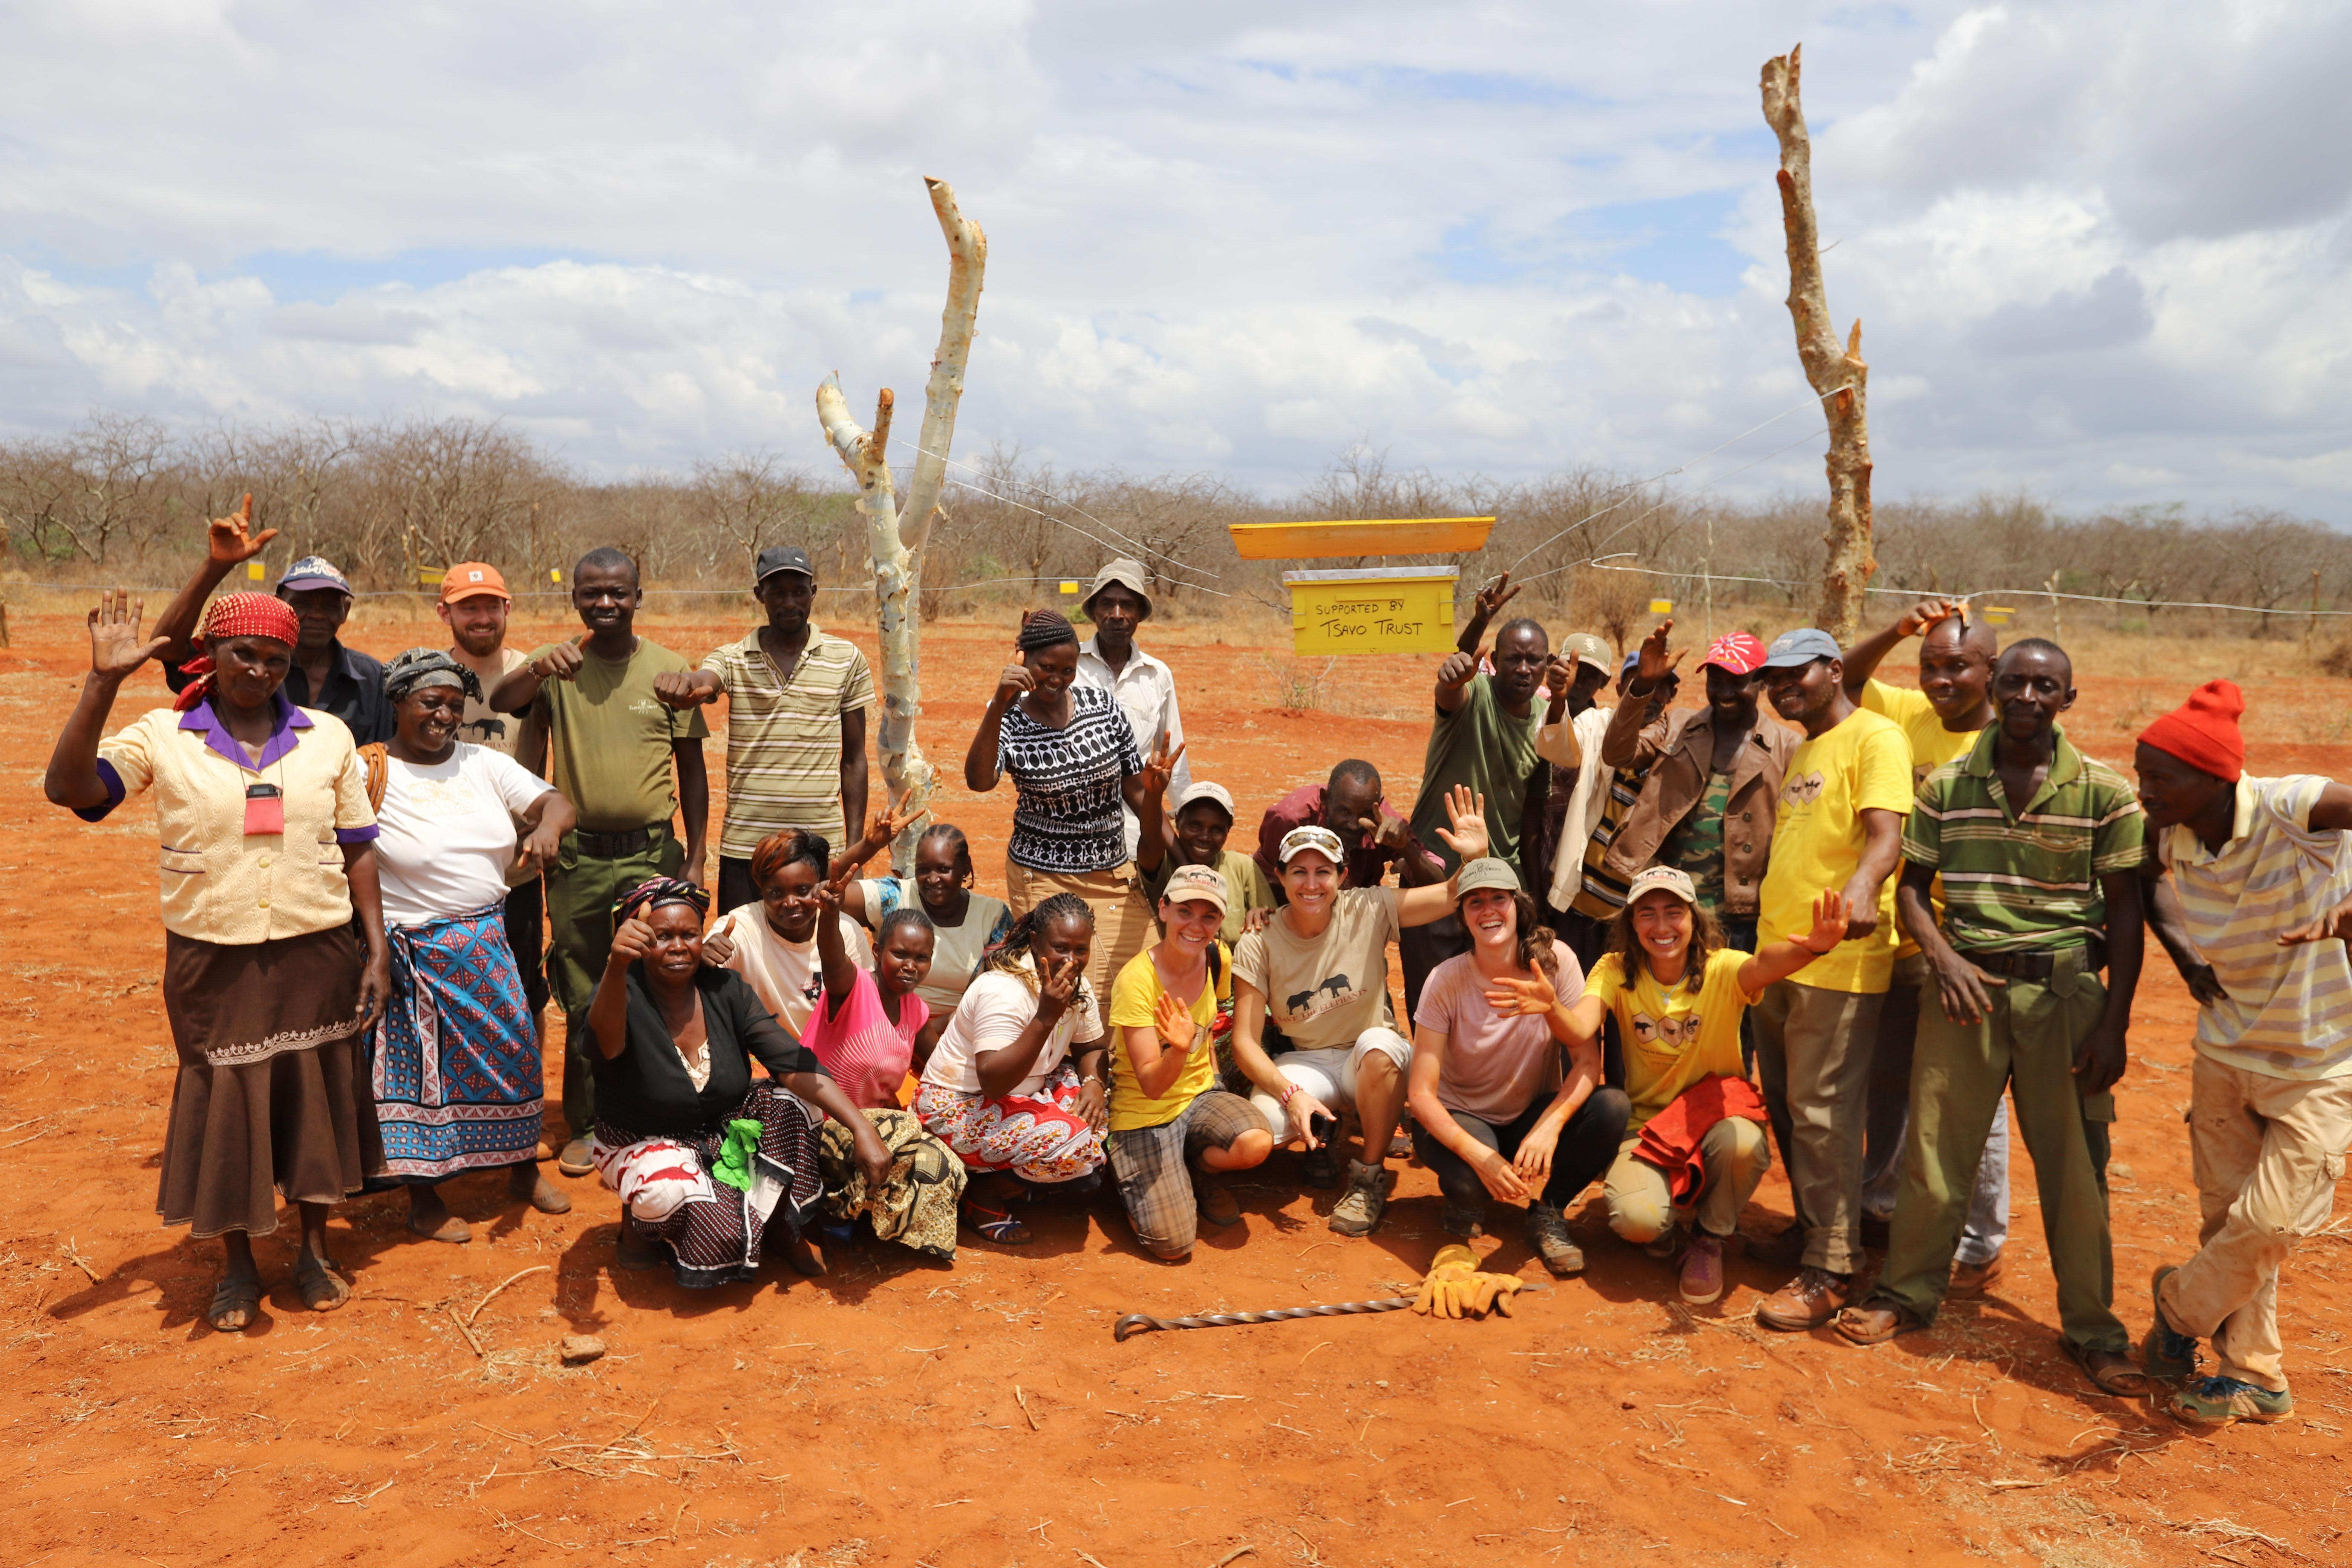 Group-photo-after-beehive-fence-construction-in-Kamungi-Conservancy-Tsavo-Trust9-©-2018-Naiya-Raja